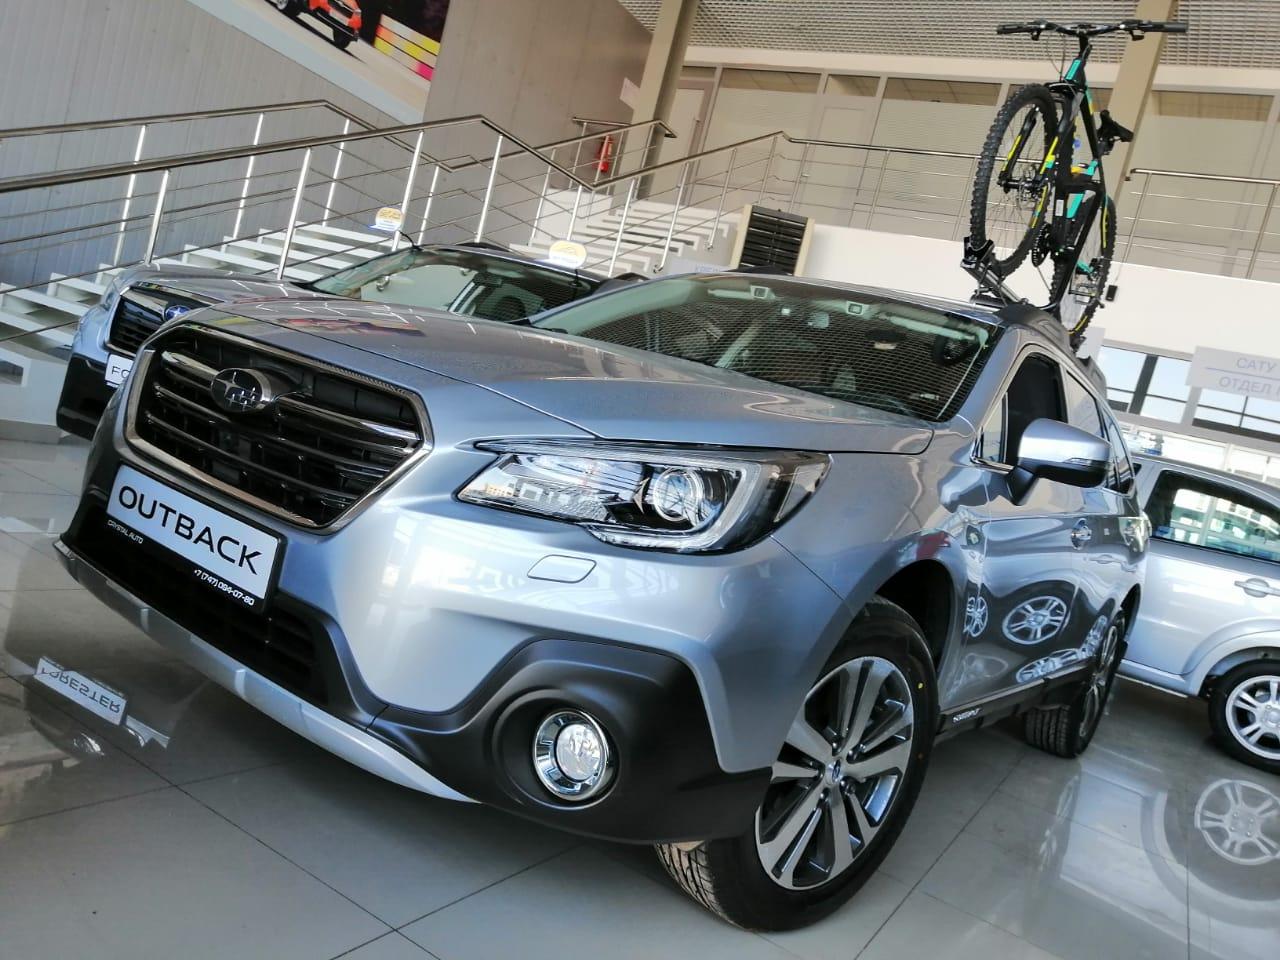 Subaru Outback Brown Edition